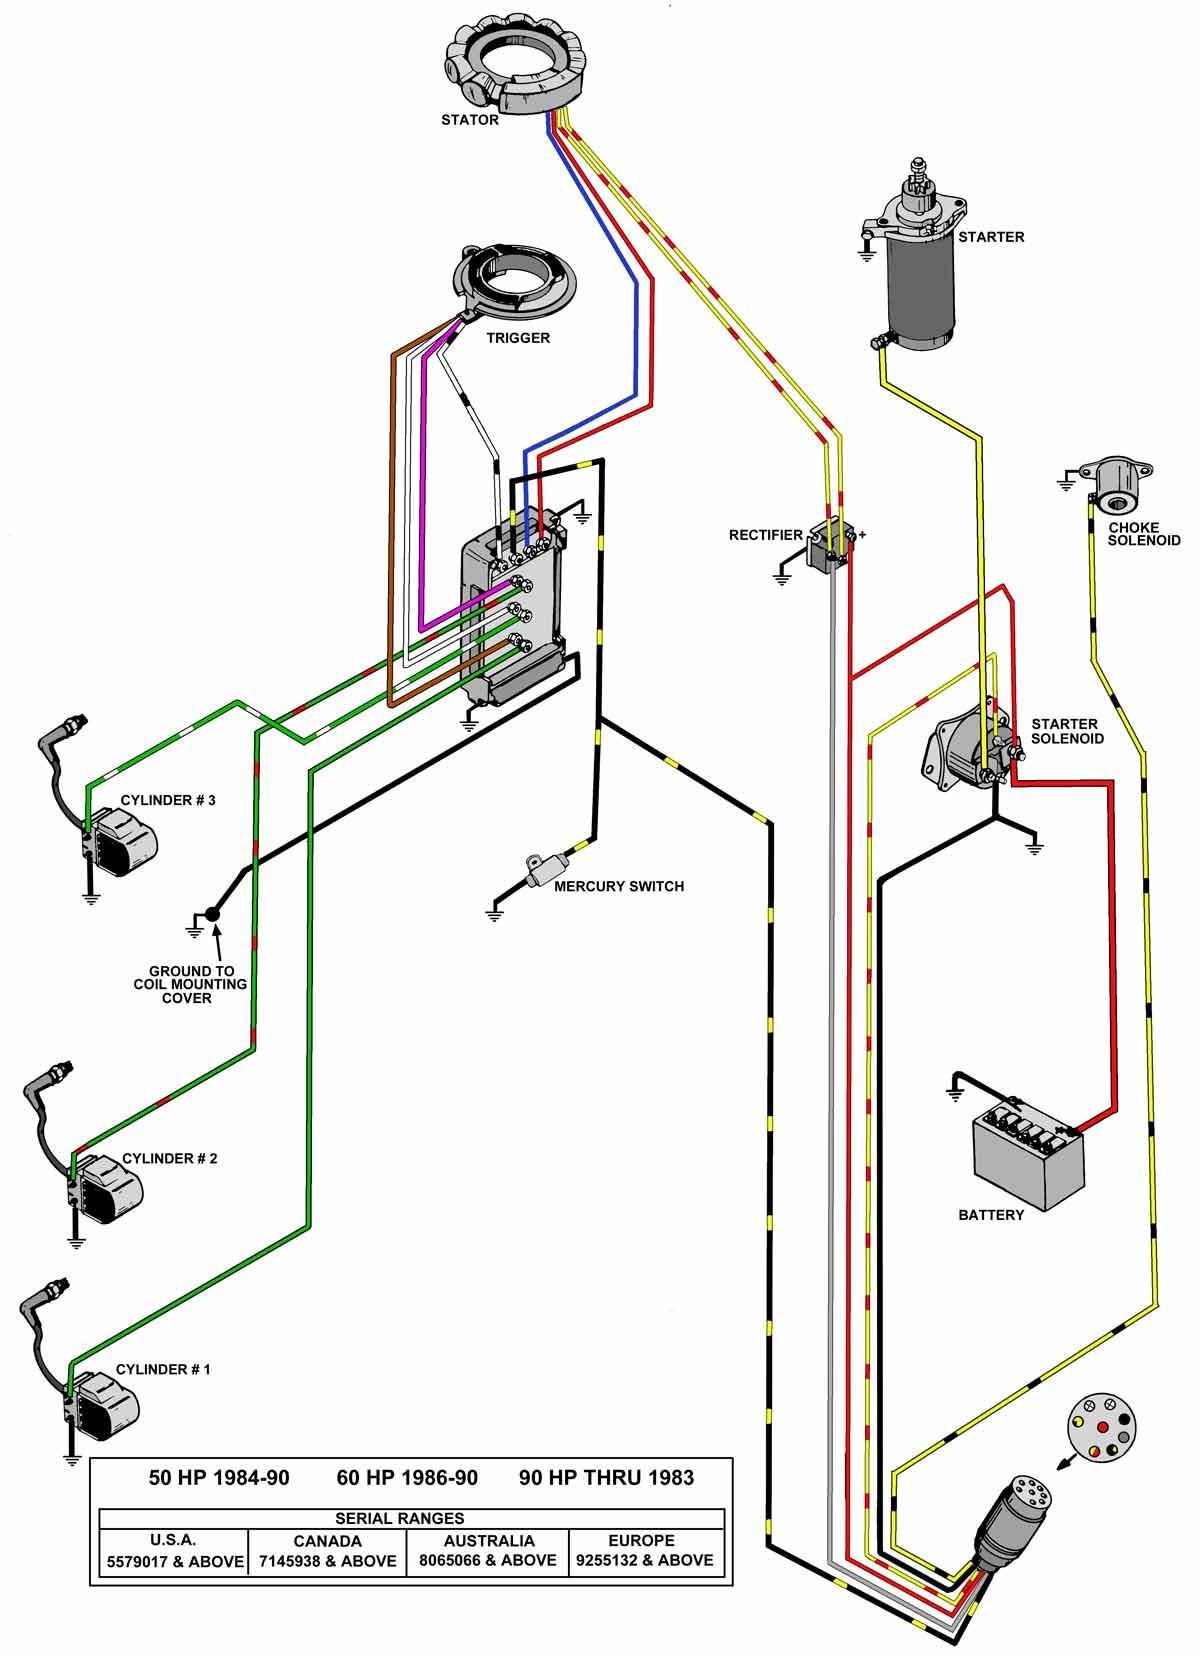 wiring diagram mercury 15hp wiring diagram and schematics 60 mercury 2 stroke tiller diagram of a four stroke engine mercury outboard tachometer wiring rh detoxicrecenze com mercury 15hp 4